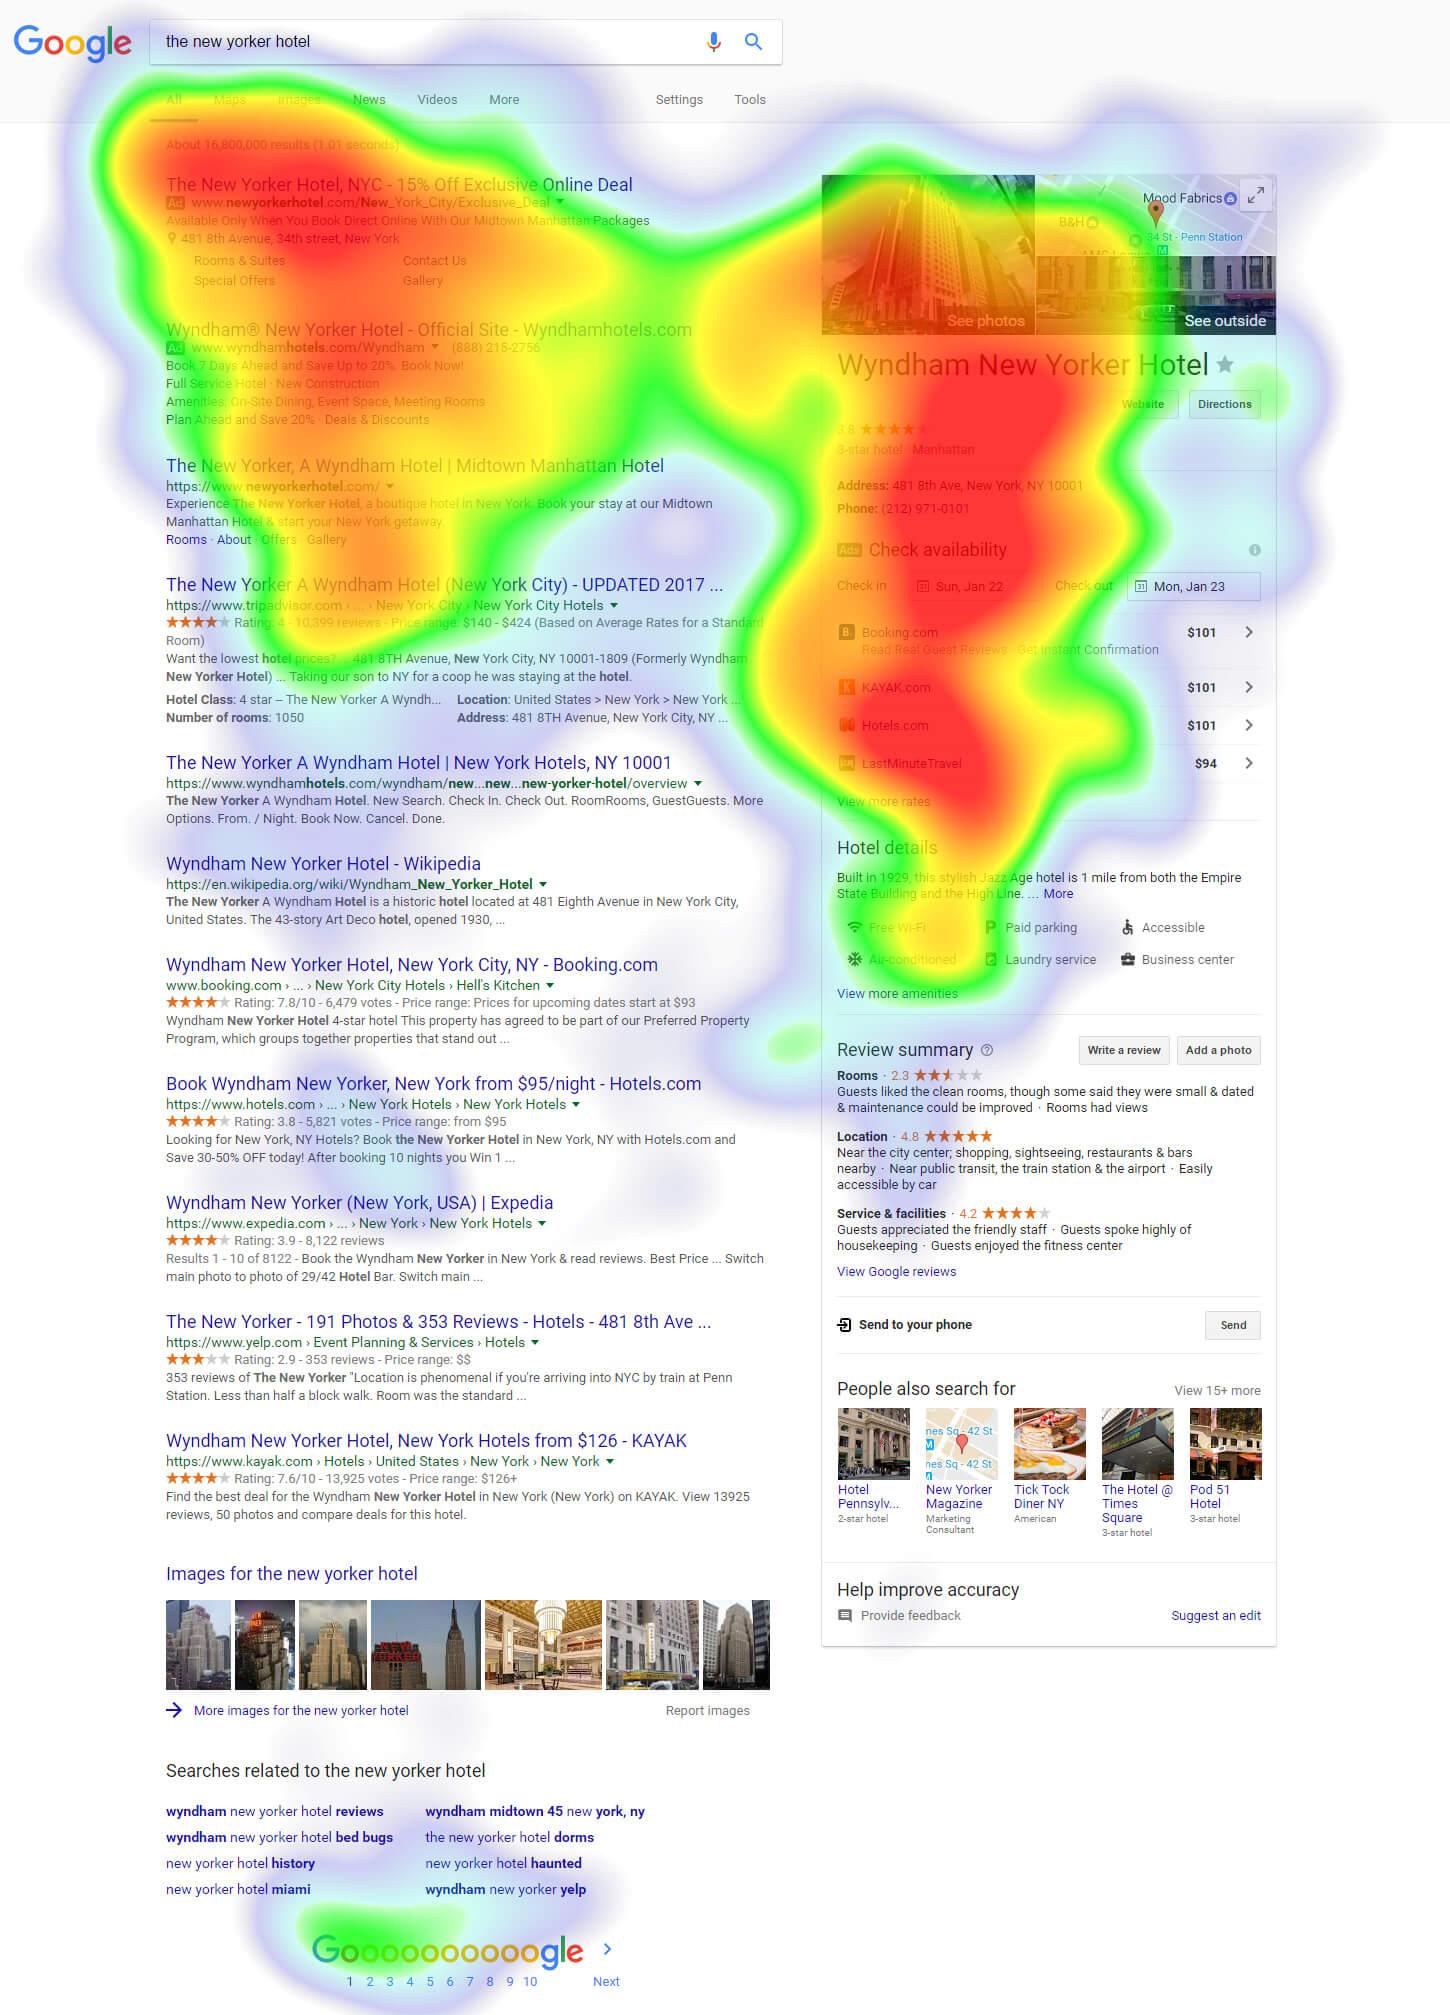 The New Yorker Hotel heatmap